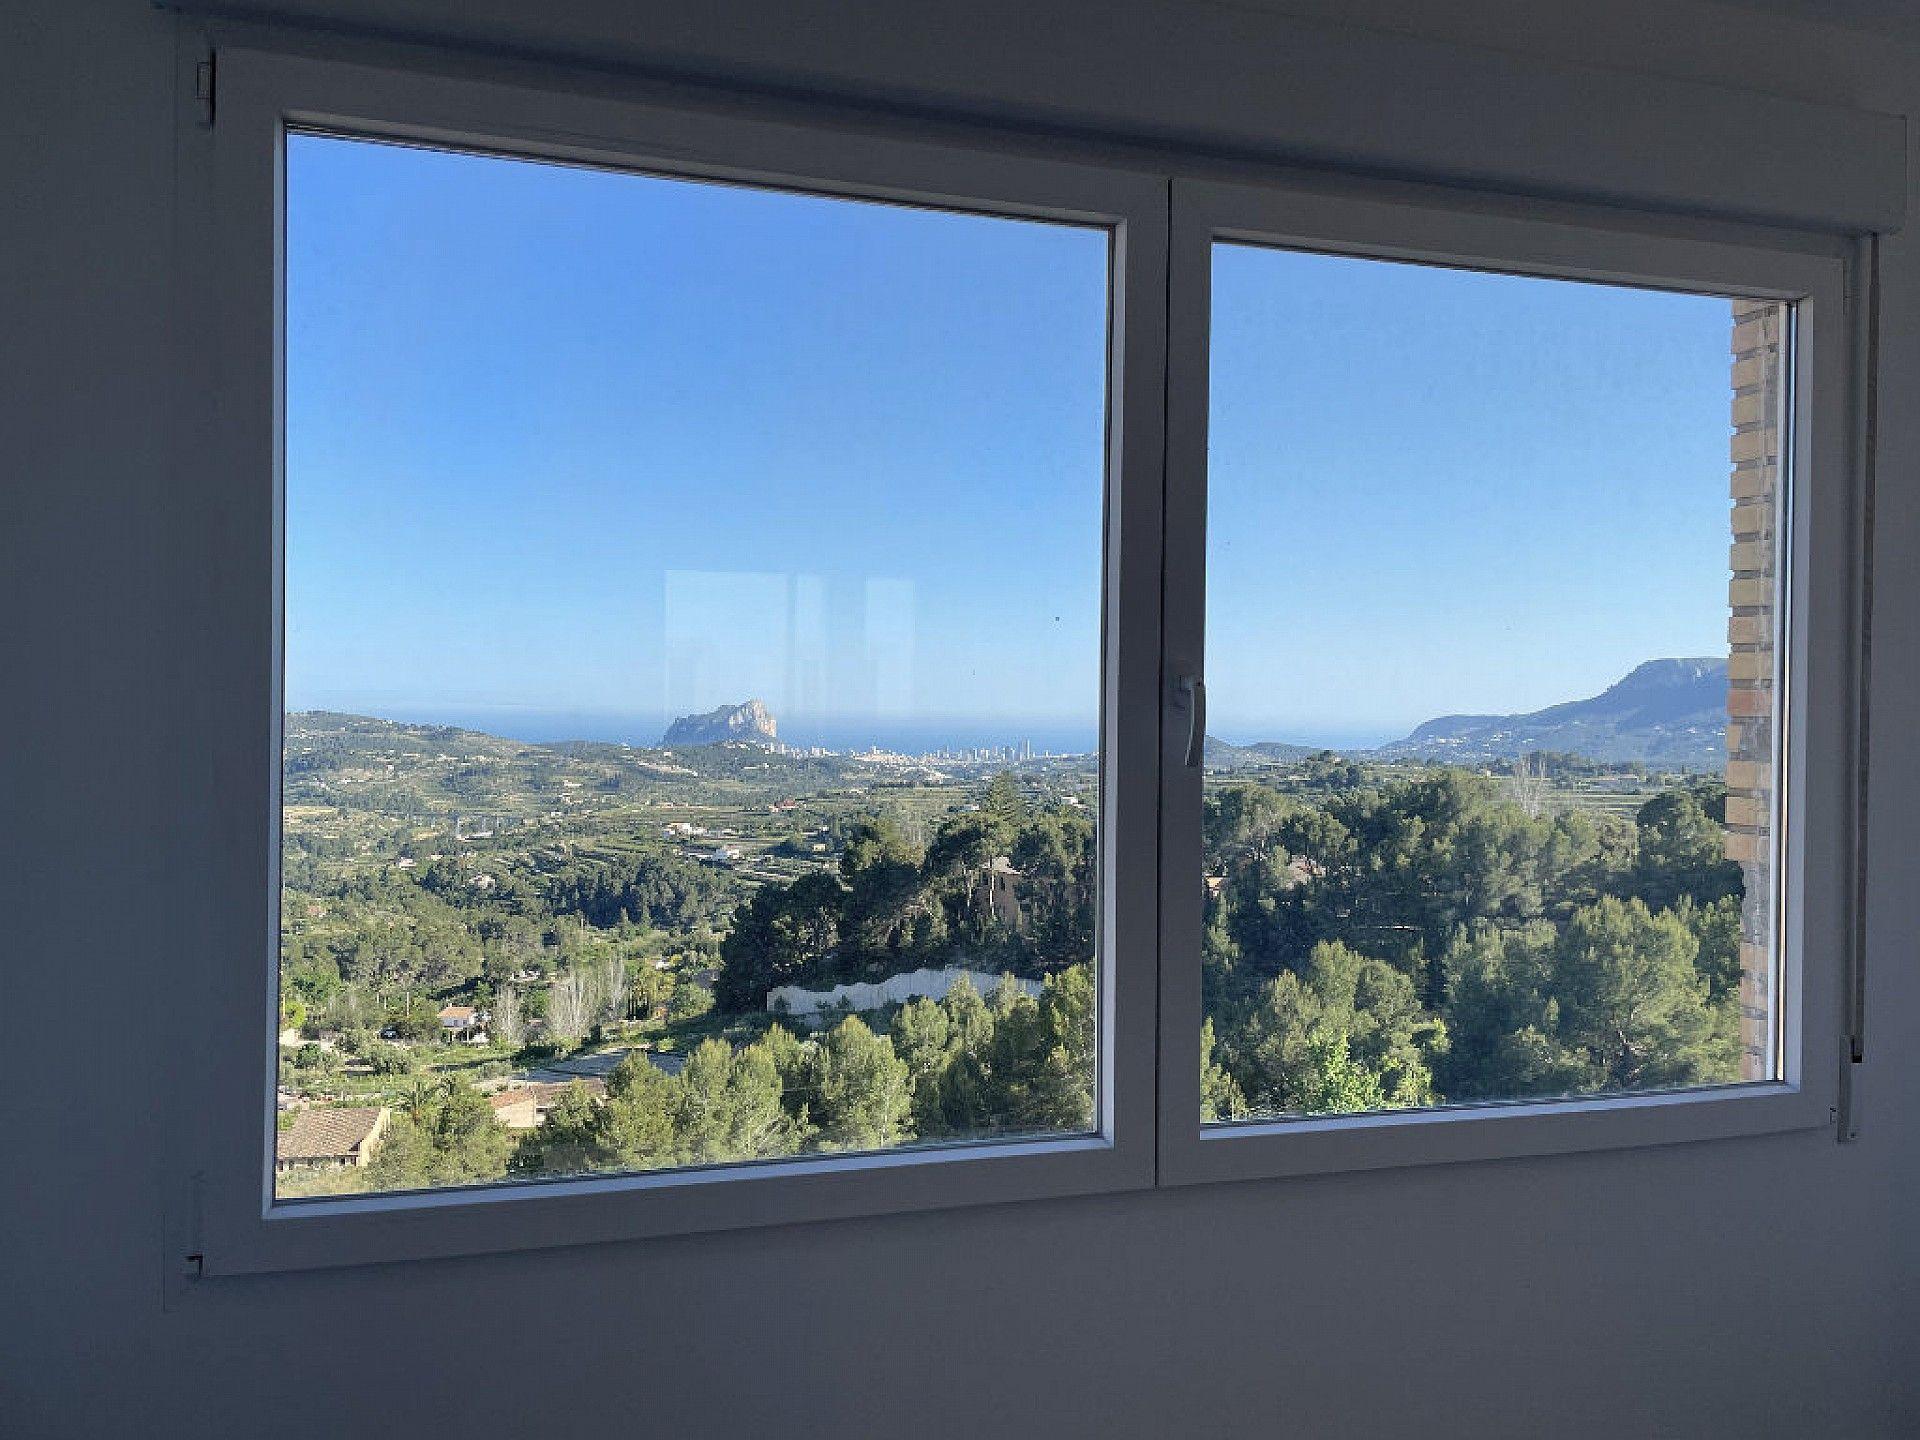 w_appartement-te-koop-costa-blanca-benissa-spanje-a1018-010-2.jpg